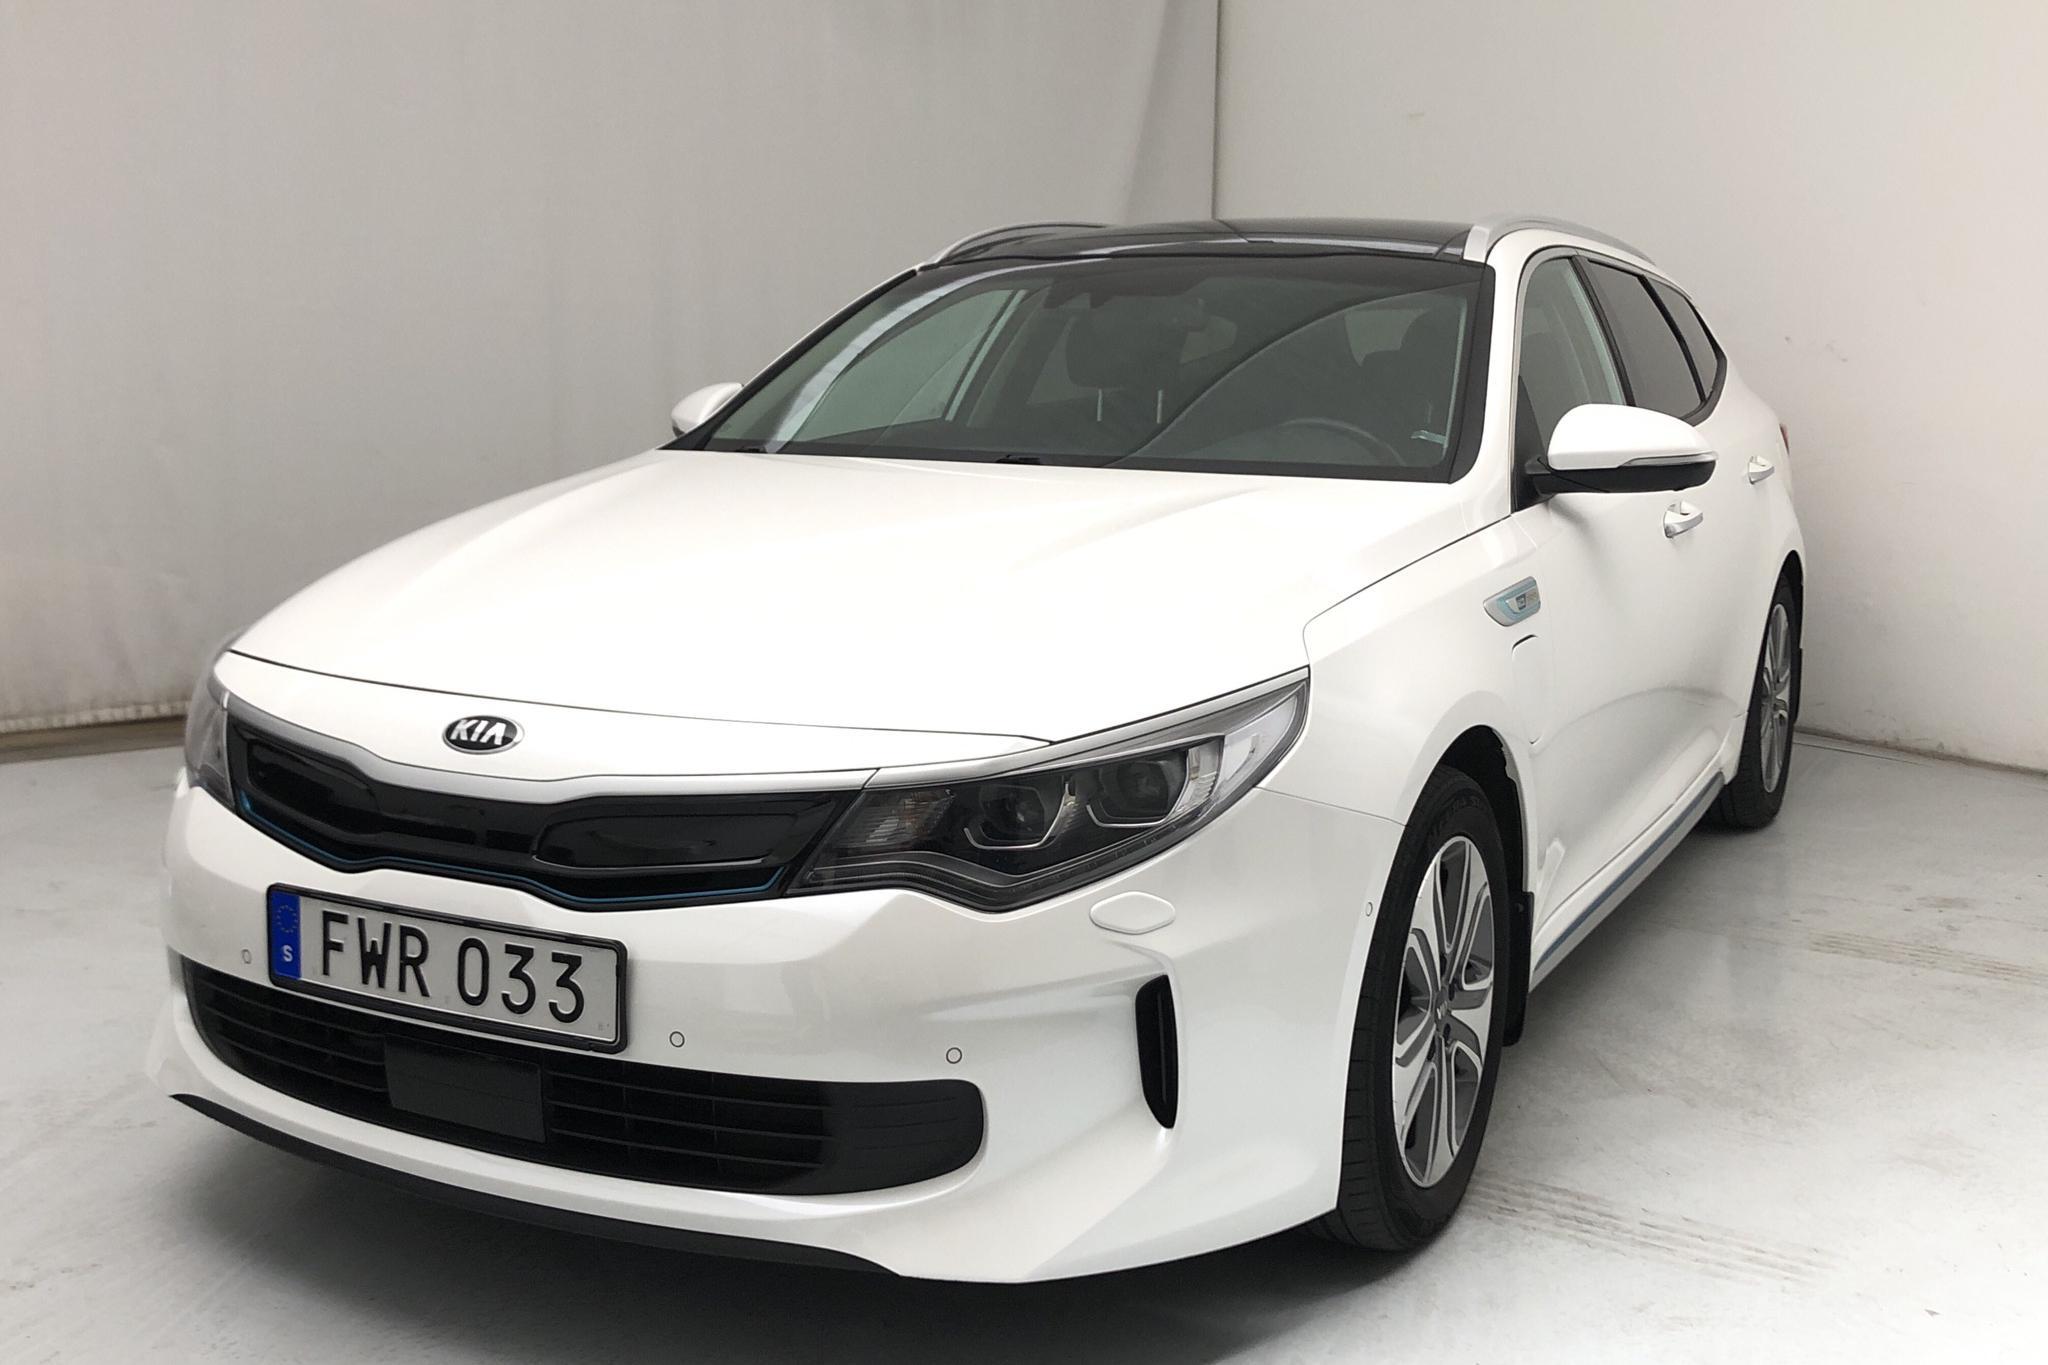 KIA Optima 2.0 GDi Plug-in Hybrid SW (205hk) - 119 250 km - Automatic - white - 2018